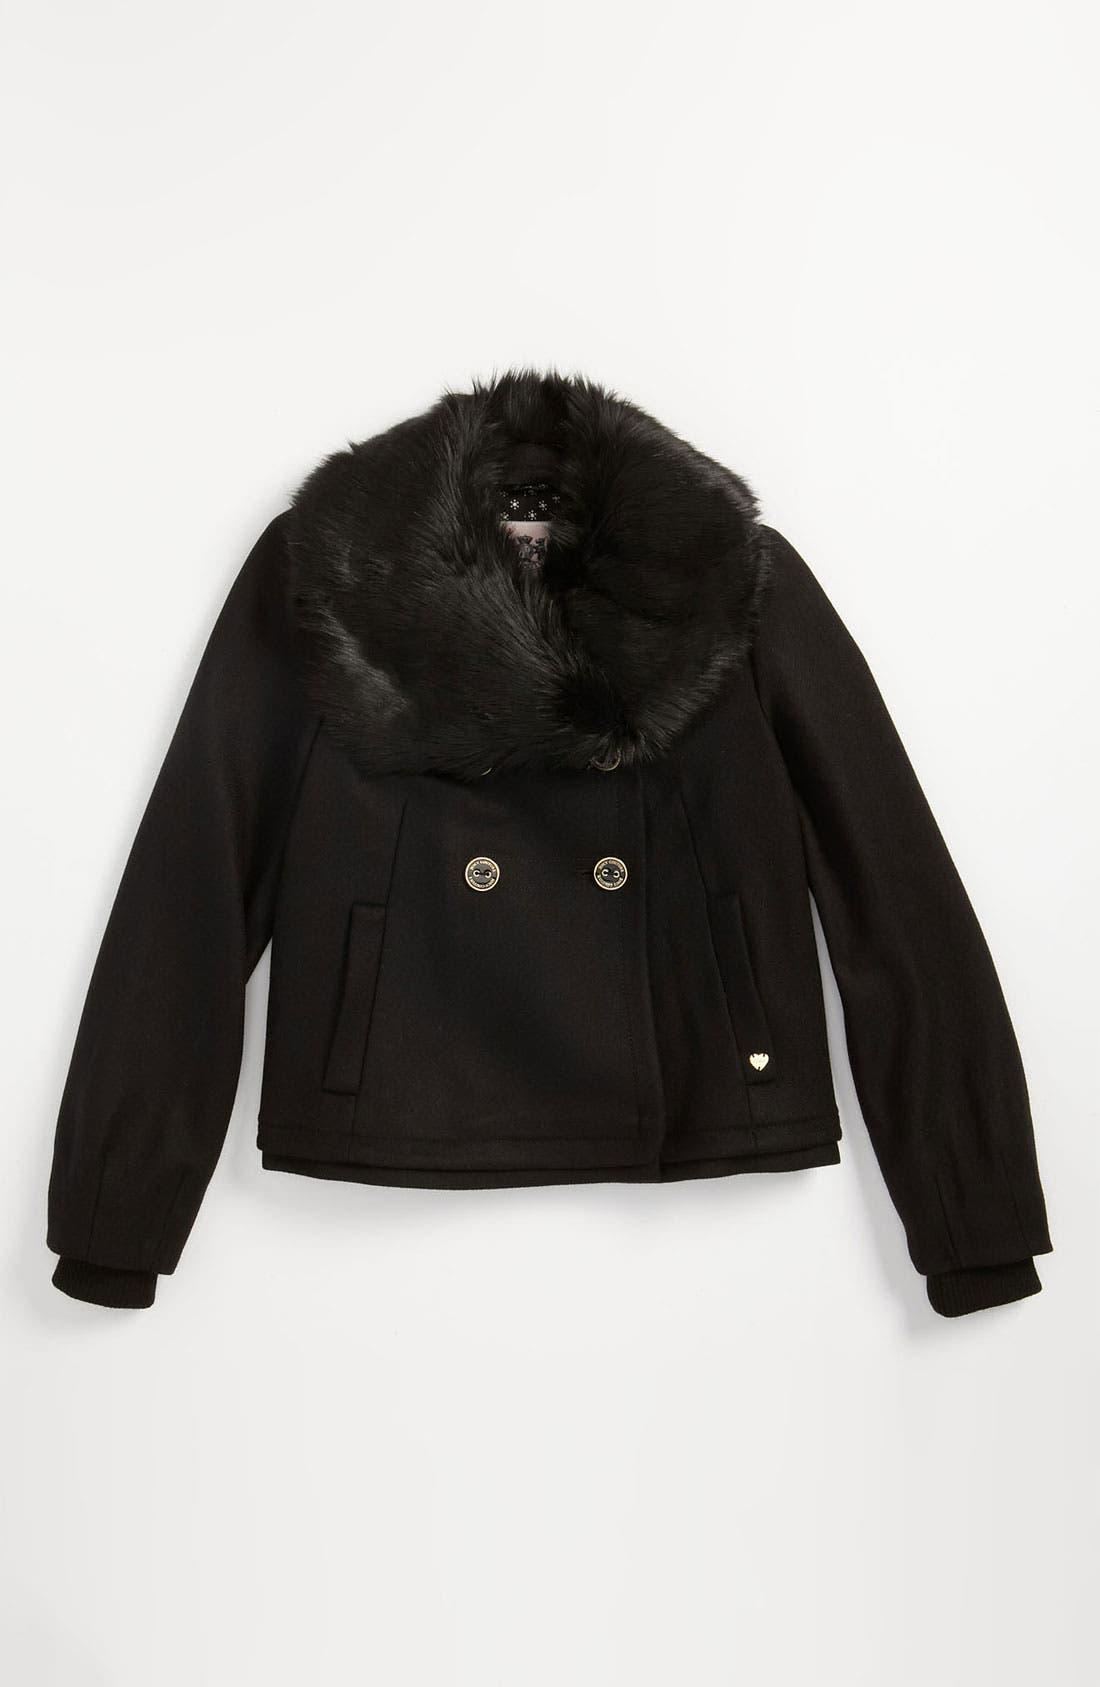 Main Image - Juicy Couture Faux Fur Collar Jacket (Little Girls & Big Girls)